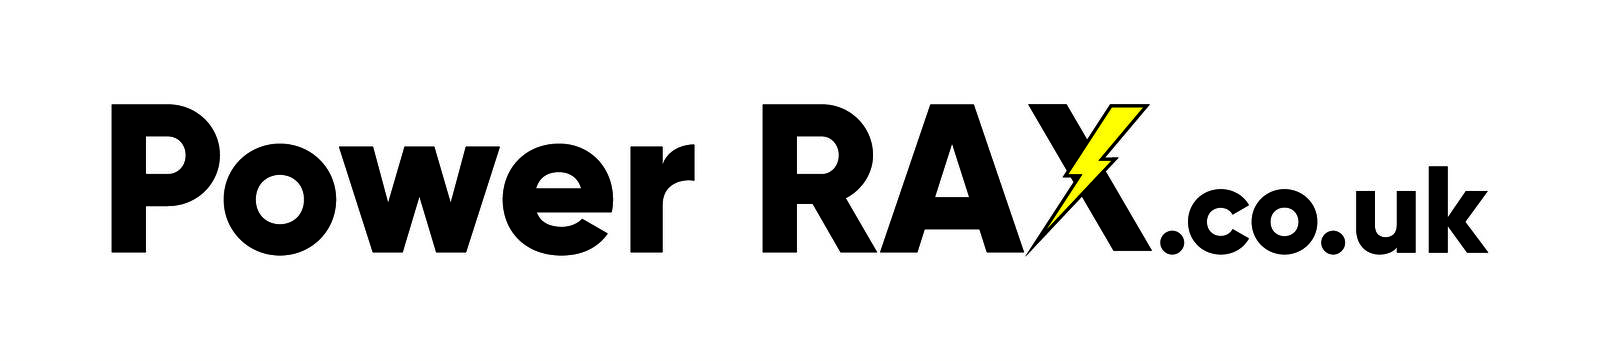 Power Rax